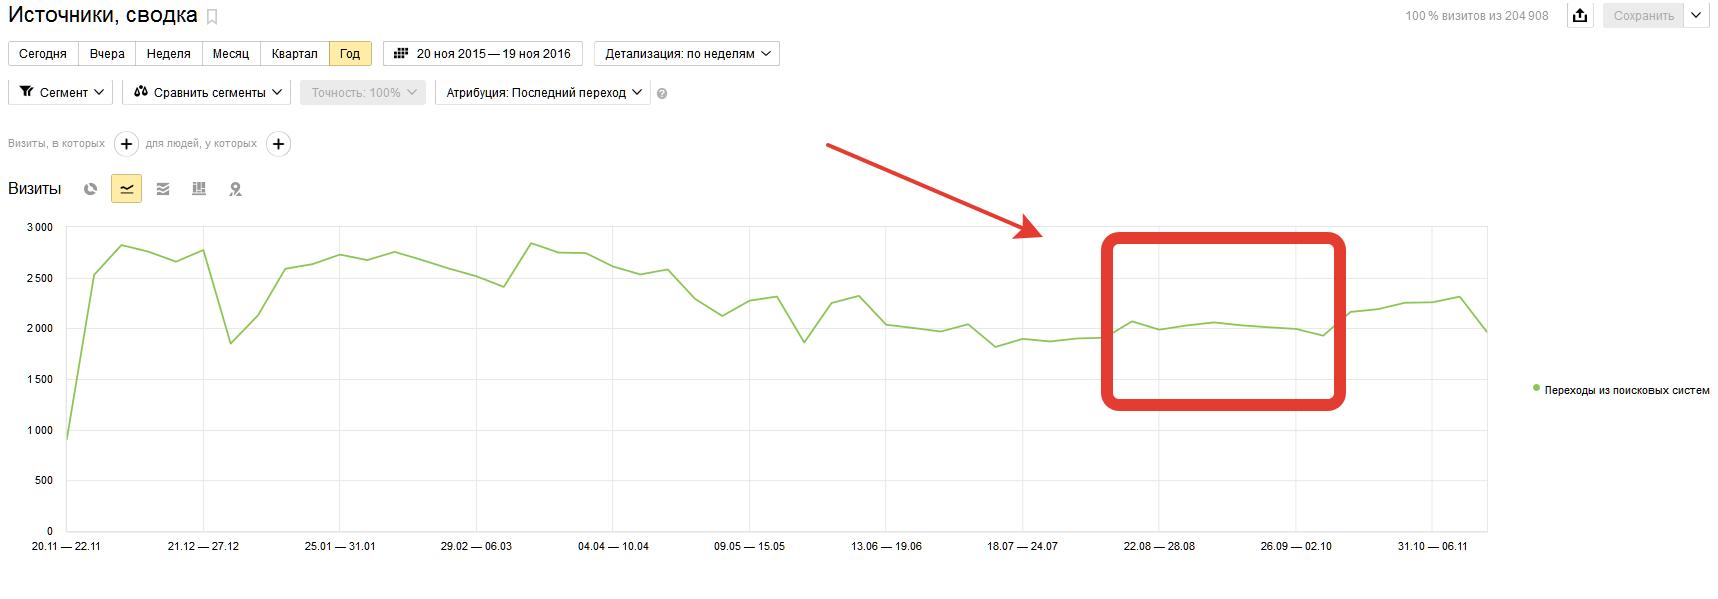 Странности нового алгоритма Яндекс Палех